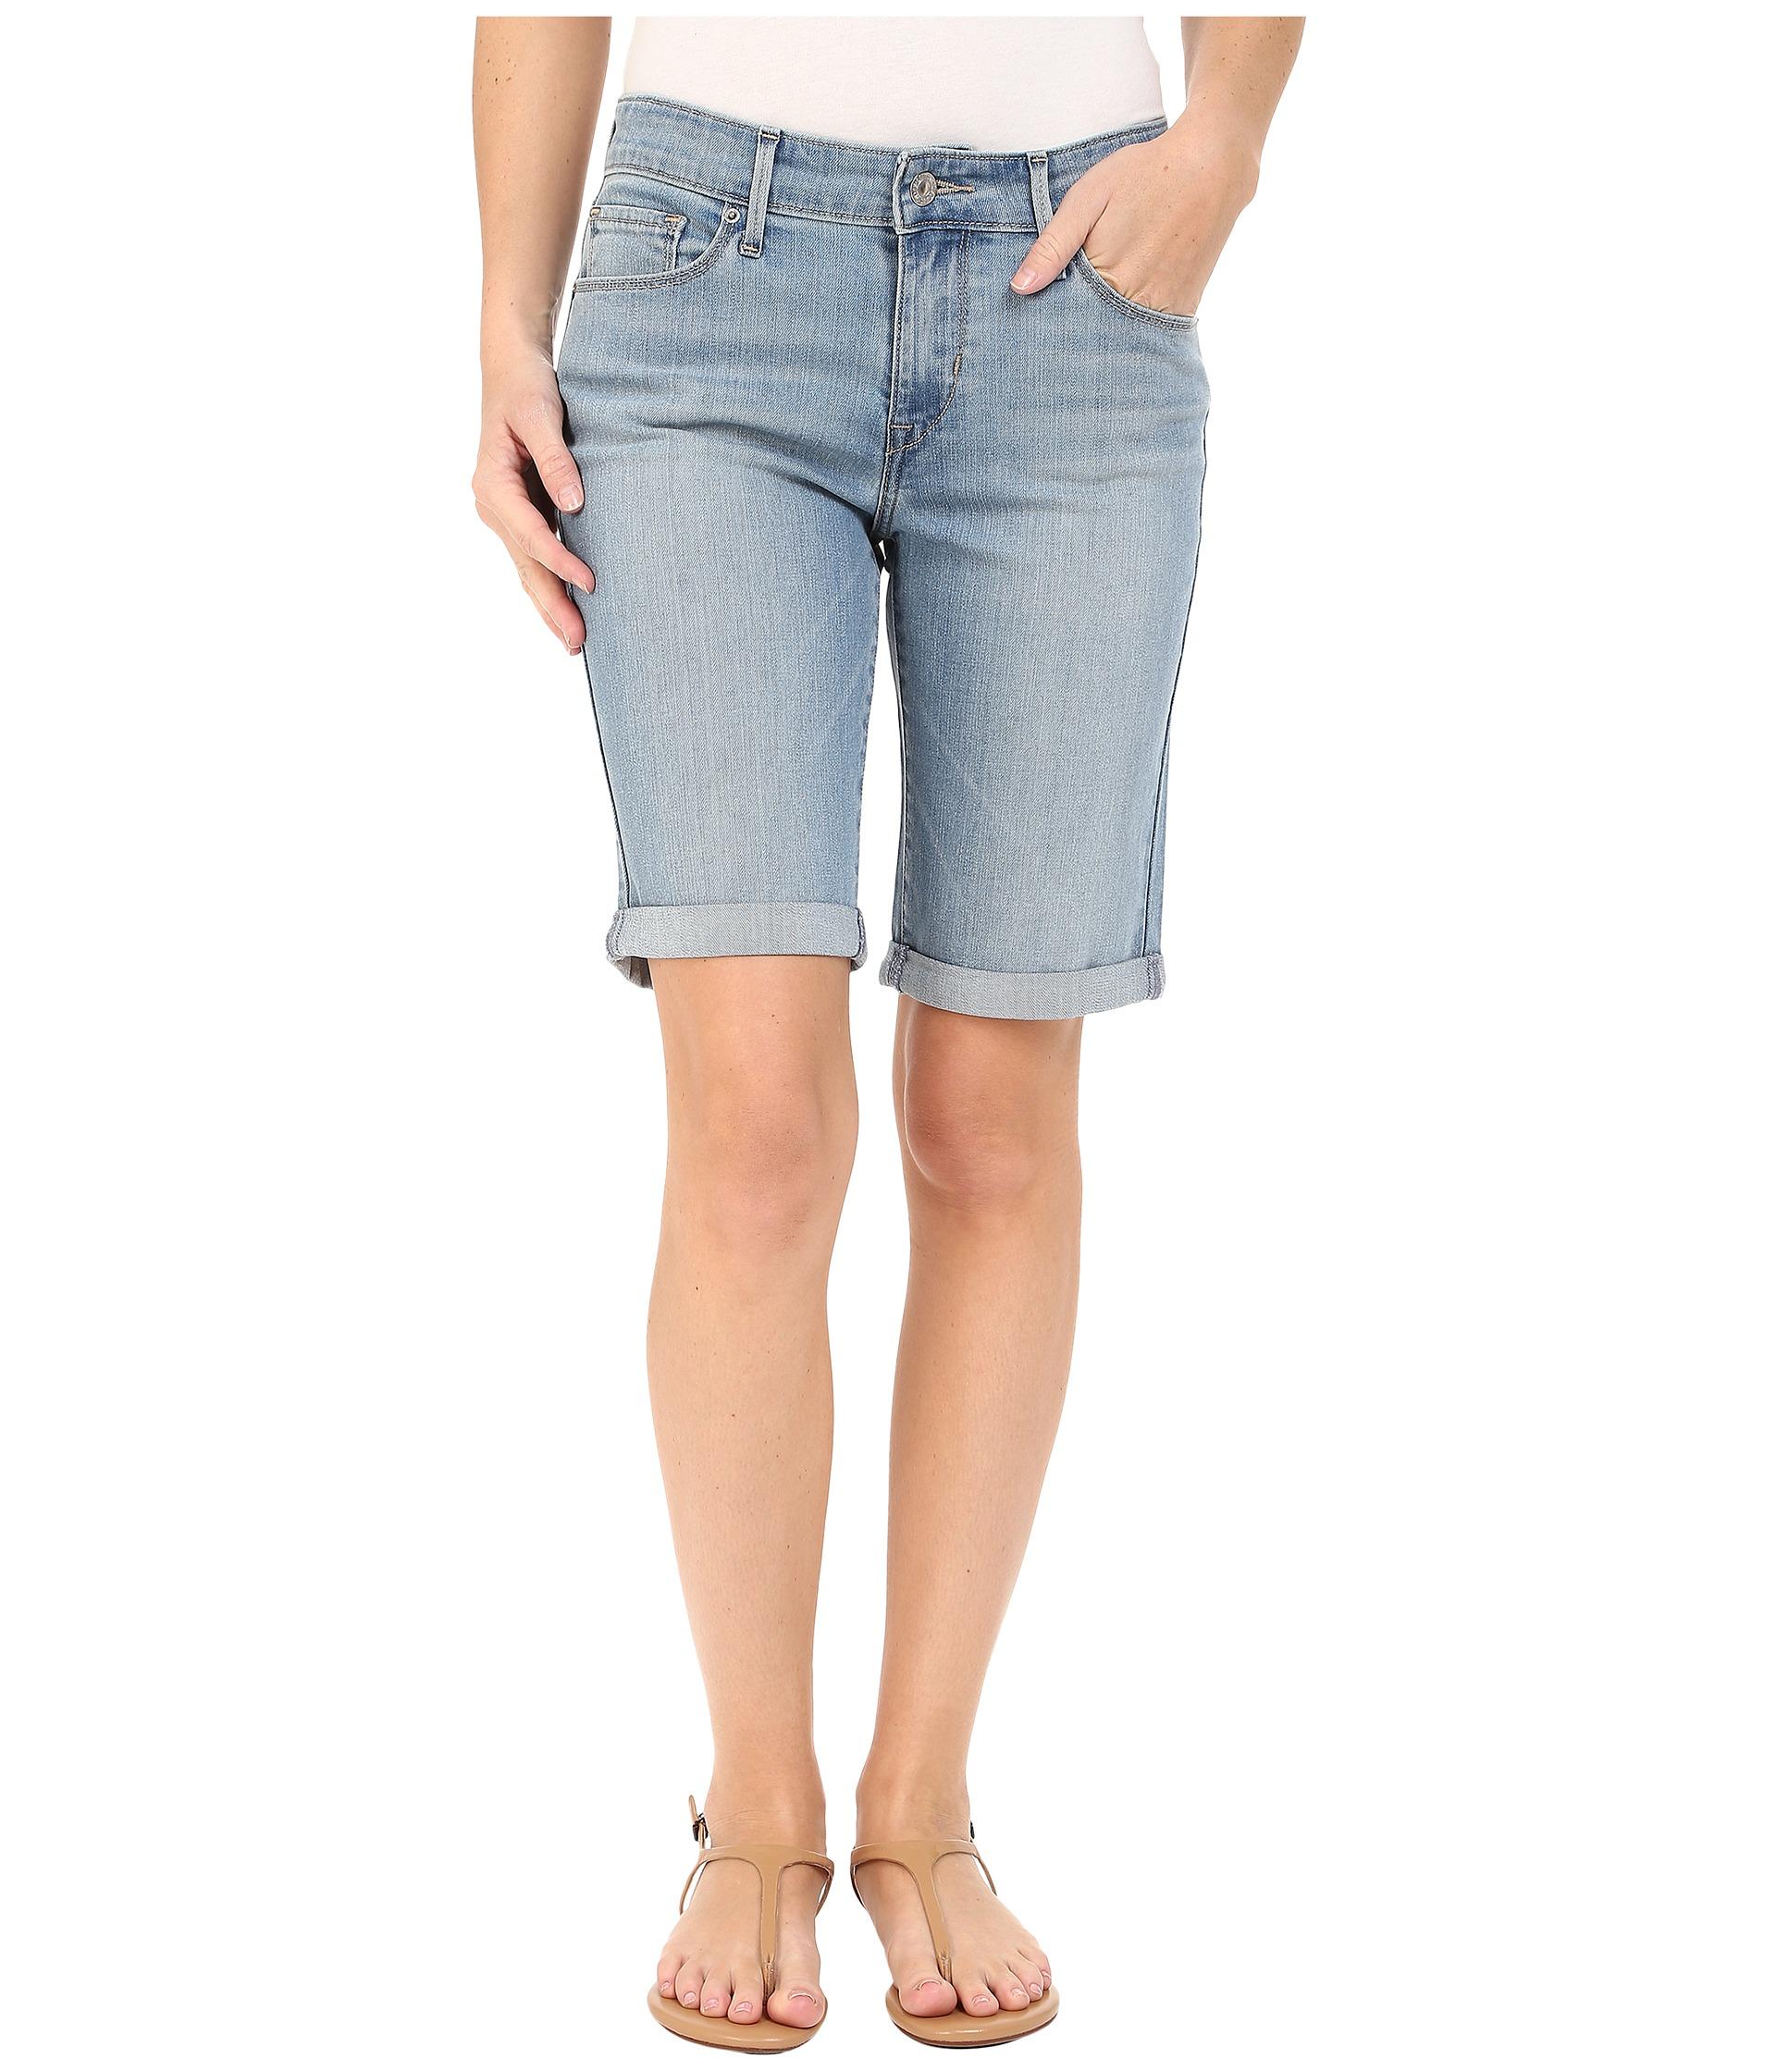 Levi's® Womens Bermuda Shorts Cold Dust - Zappos.com Free Shipping BOTH Ways